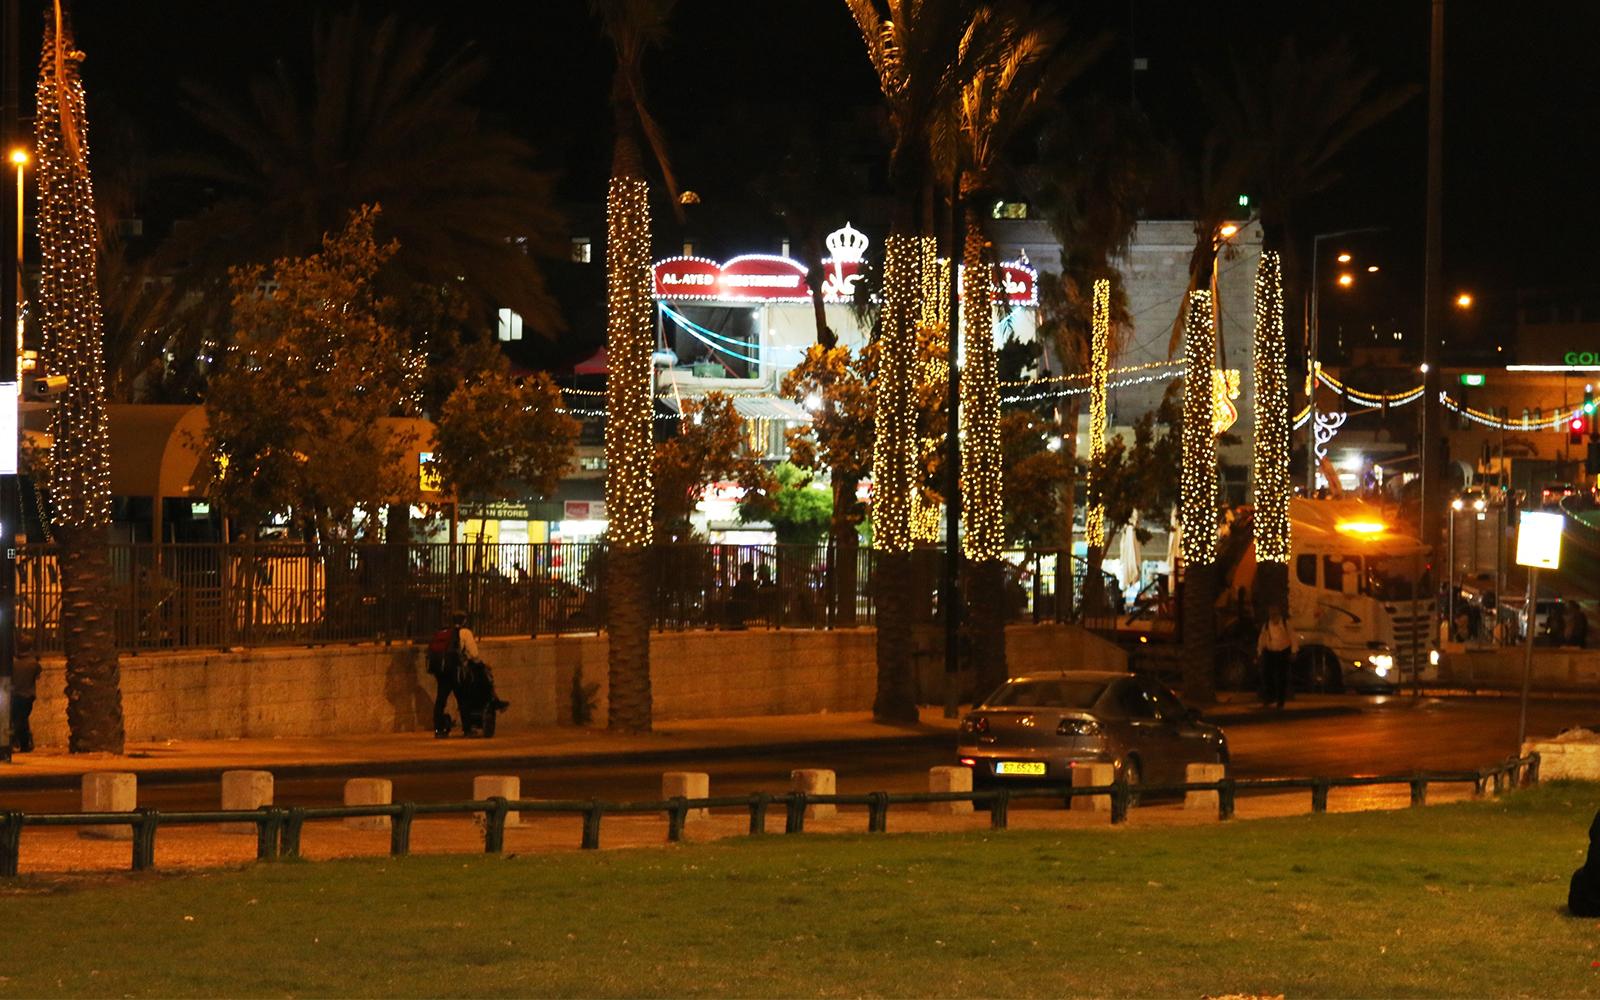 Lights festoon palm trees across from Palms' Plaza. (Shmuel Bar-Am)